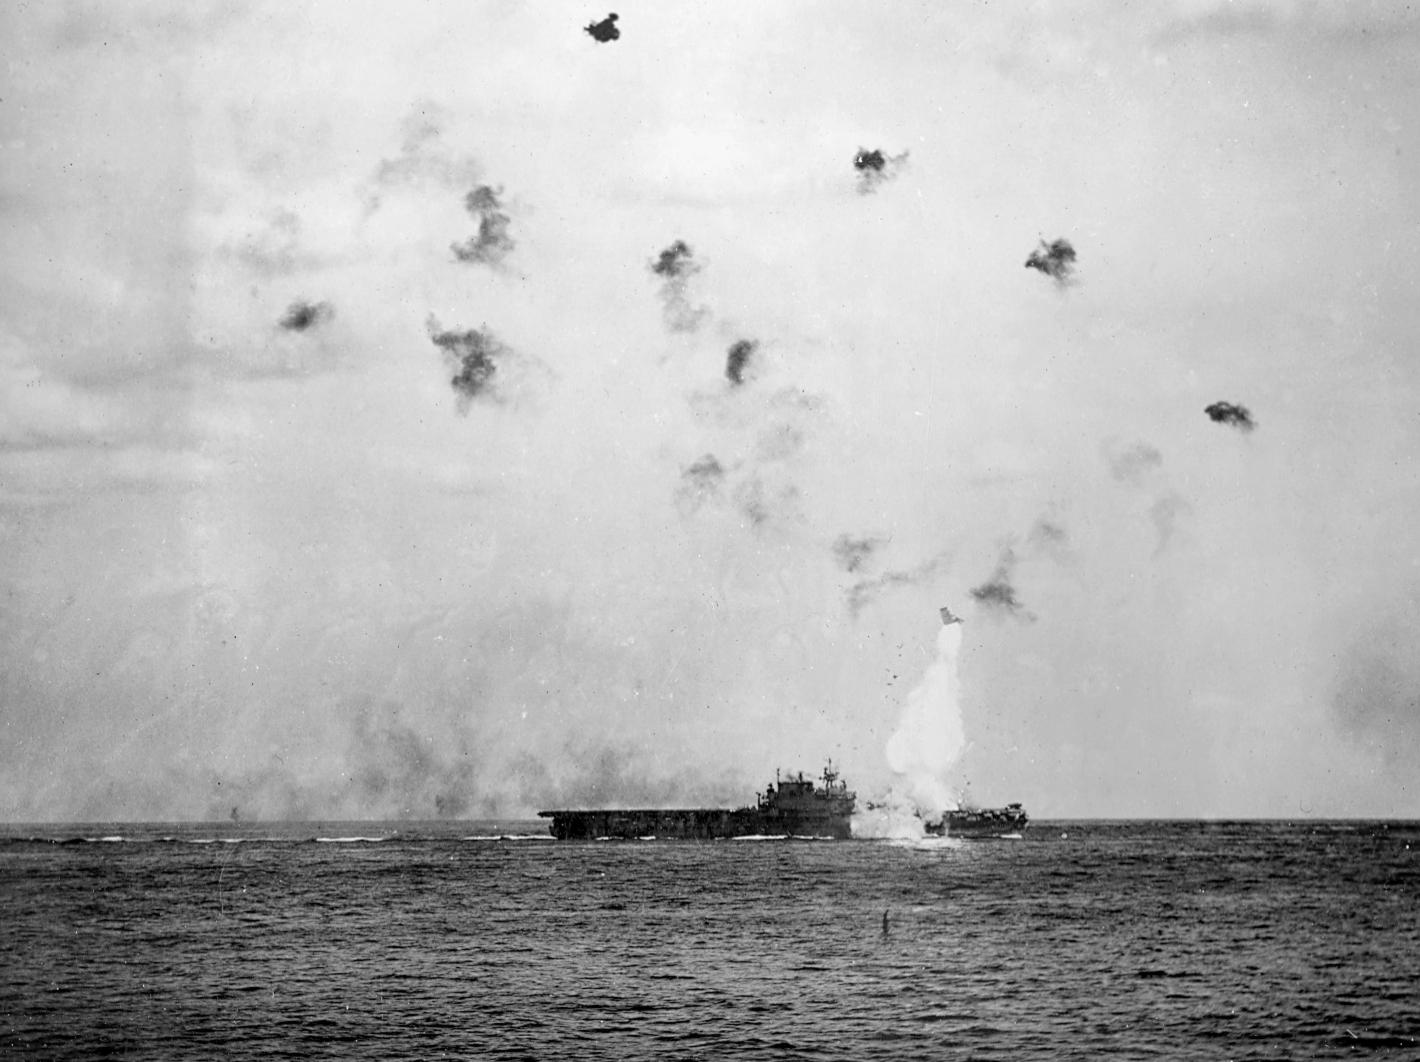 Nosač USS Enterprise CV-6 - pogodak kamikaze 14. svibnja 1945.